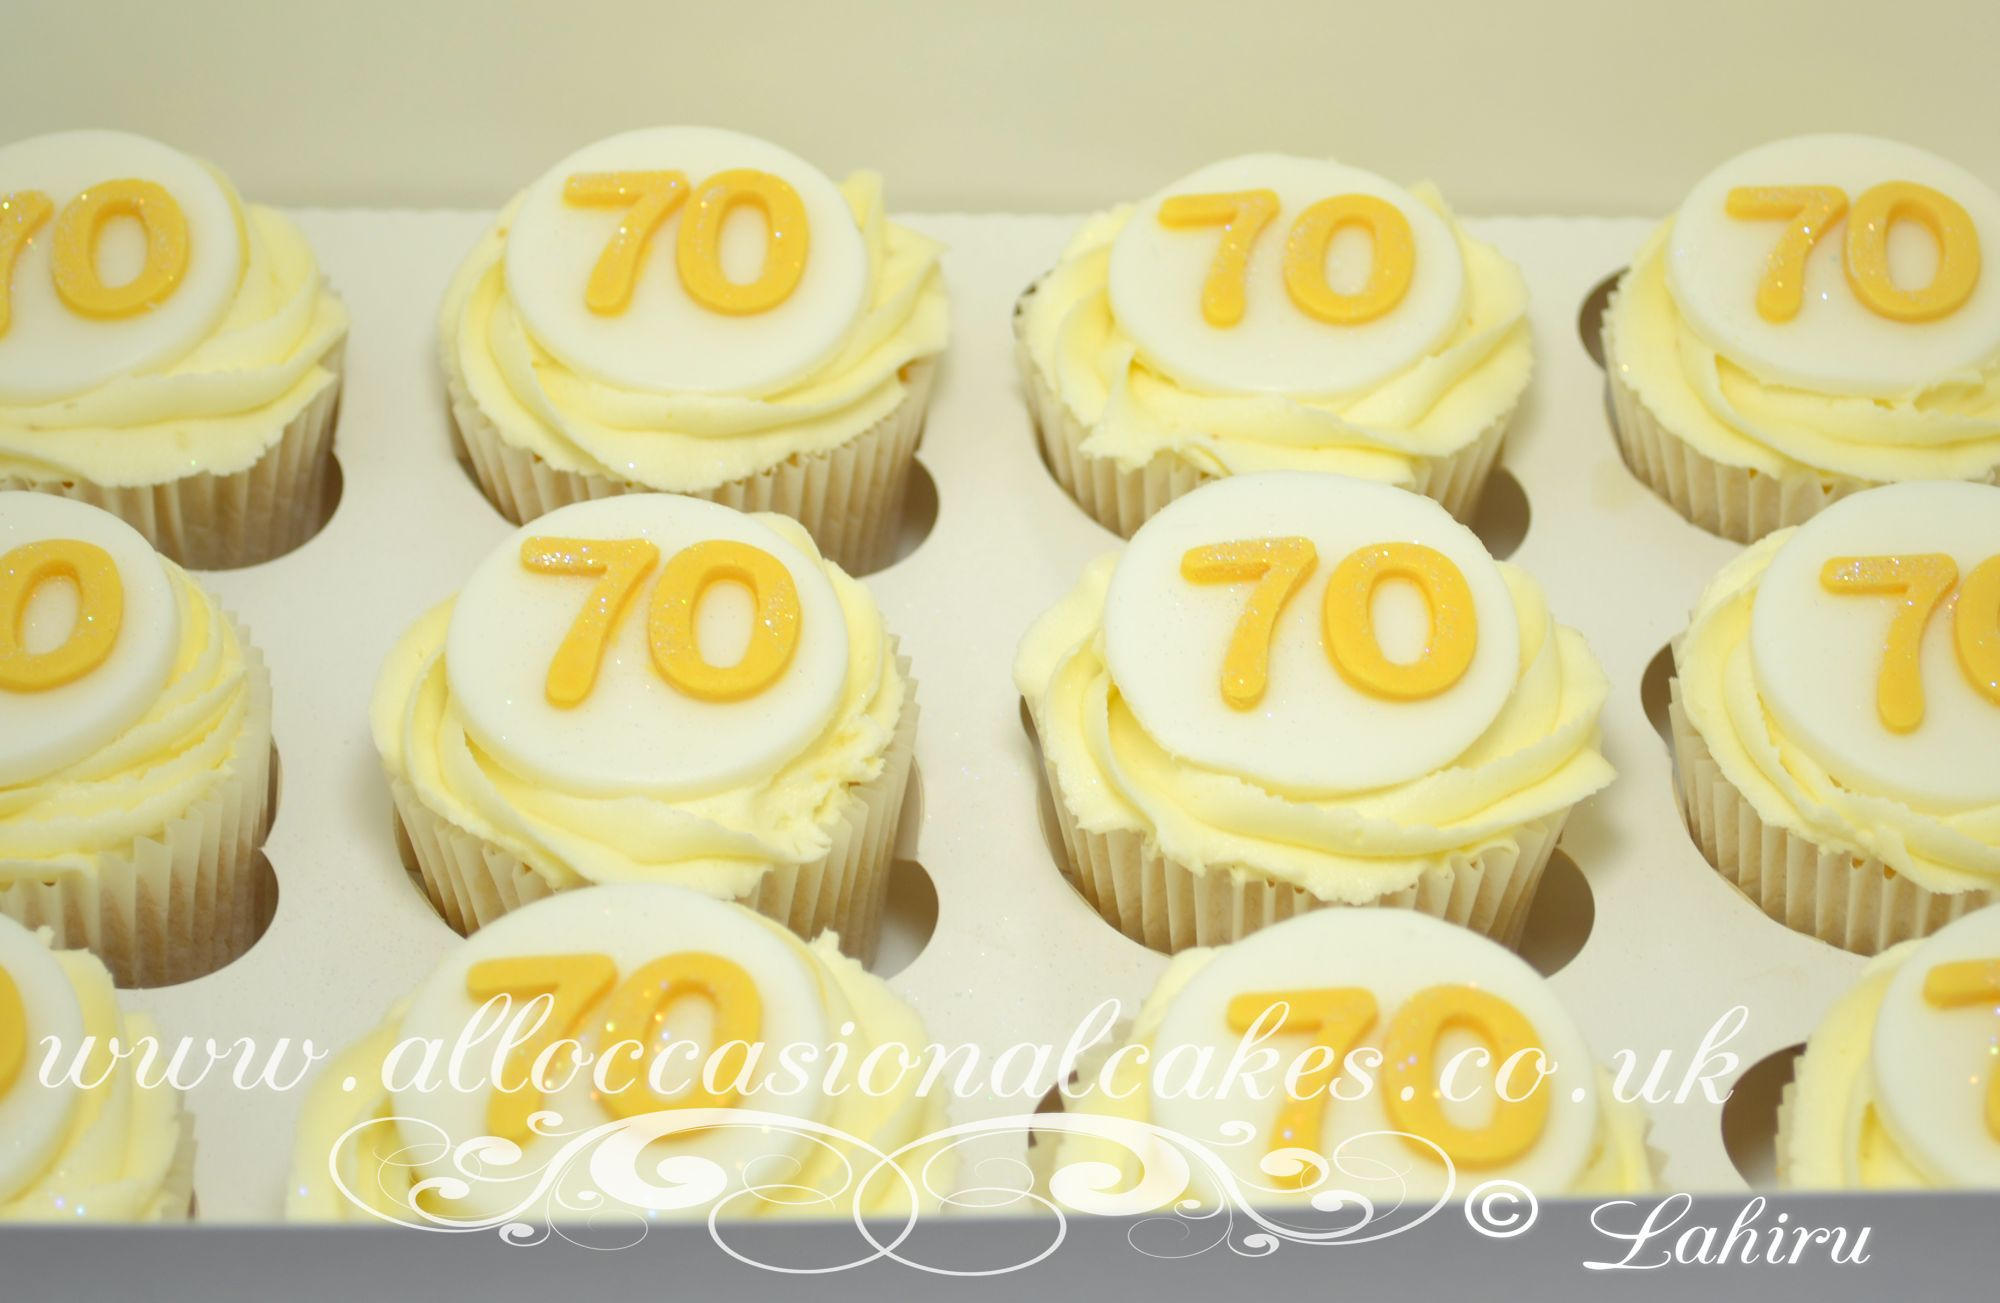 70 th birthday cupcakes